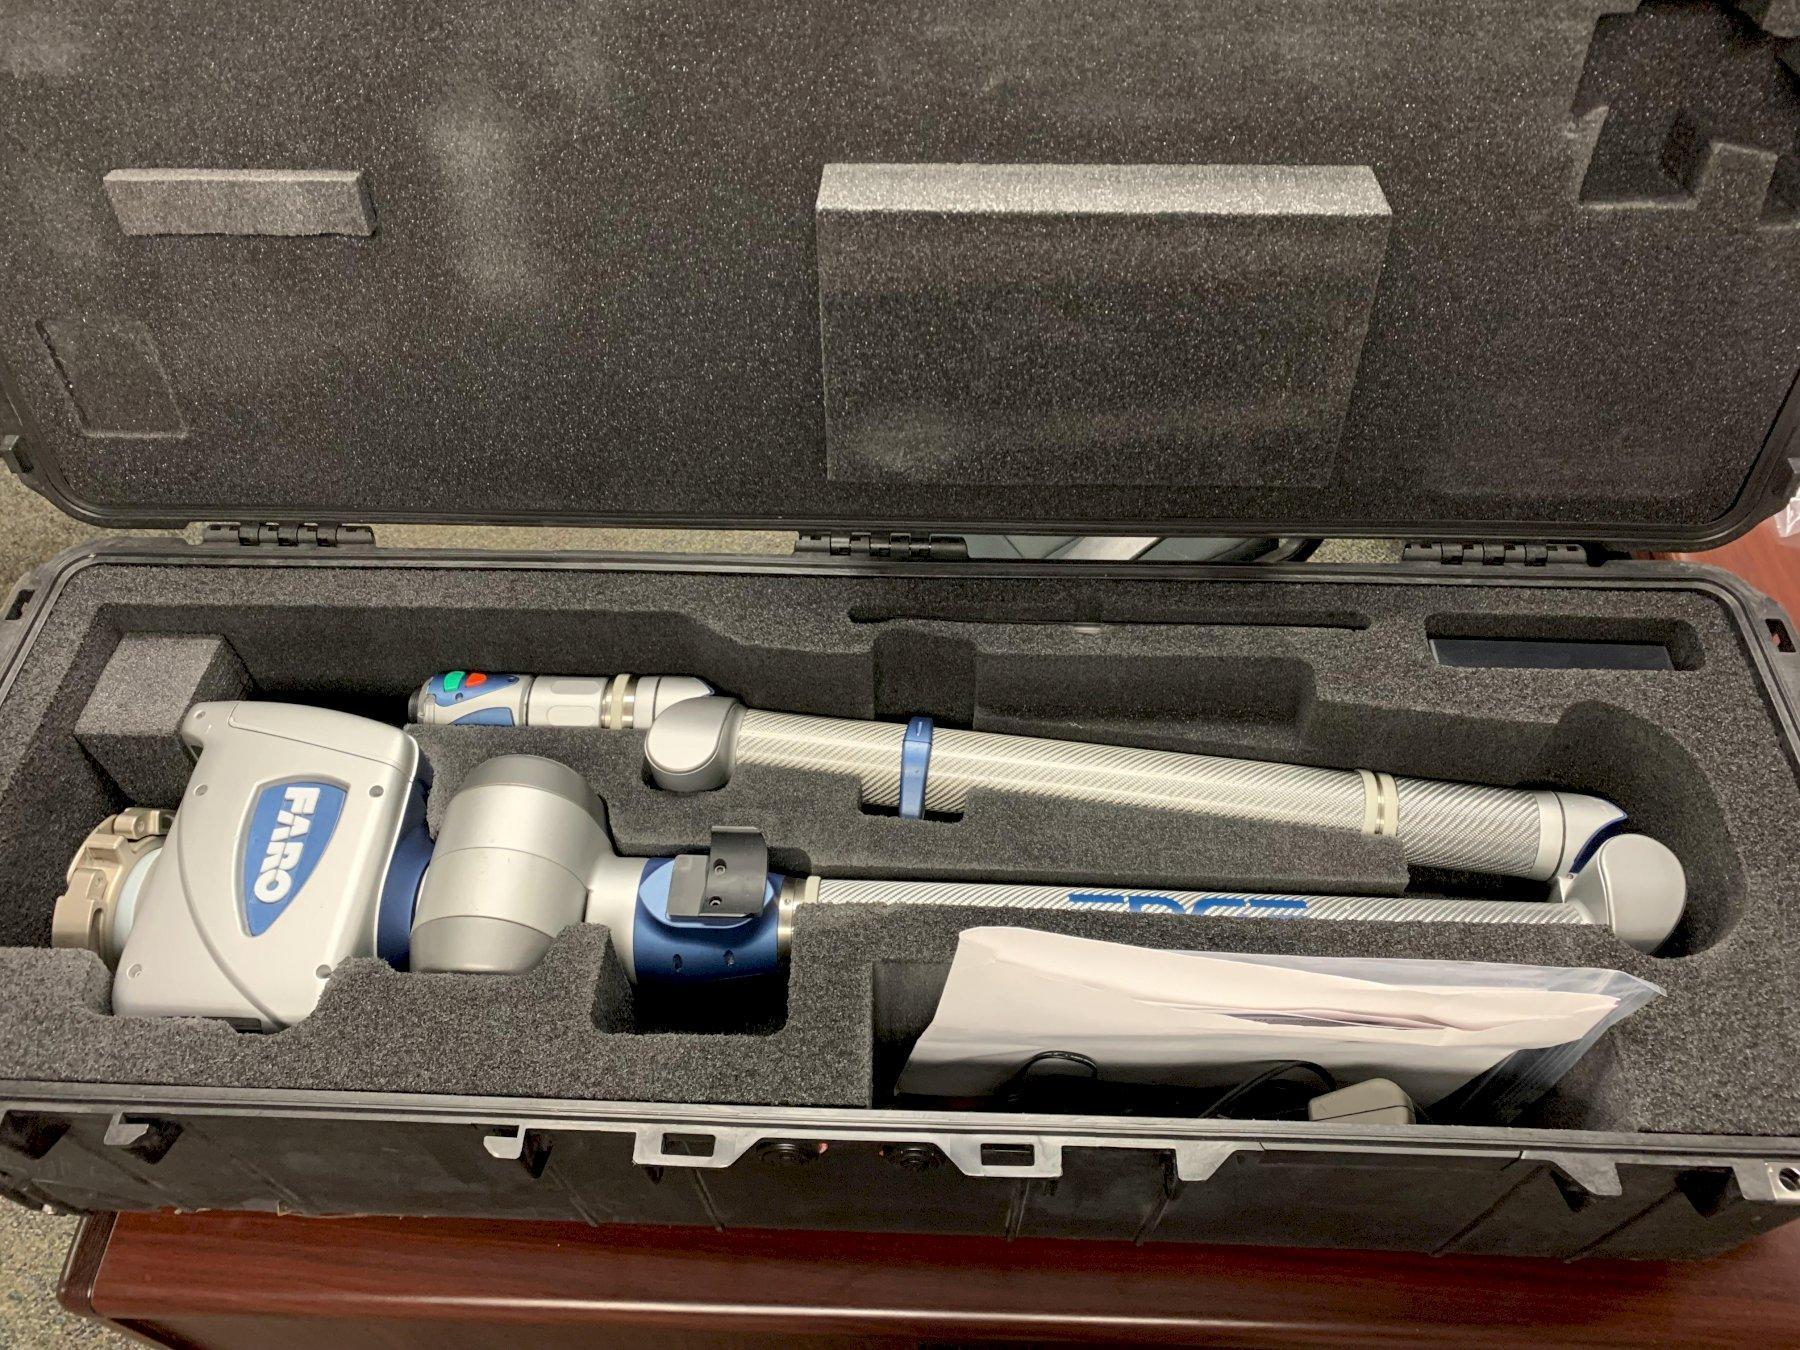 Faro Edge Portable CMM with Laser Probe, S/N E09-05-16-14419.